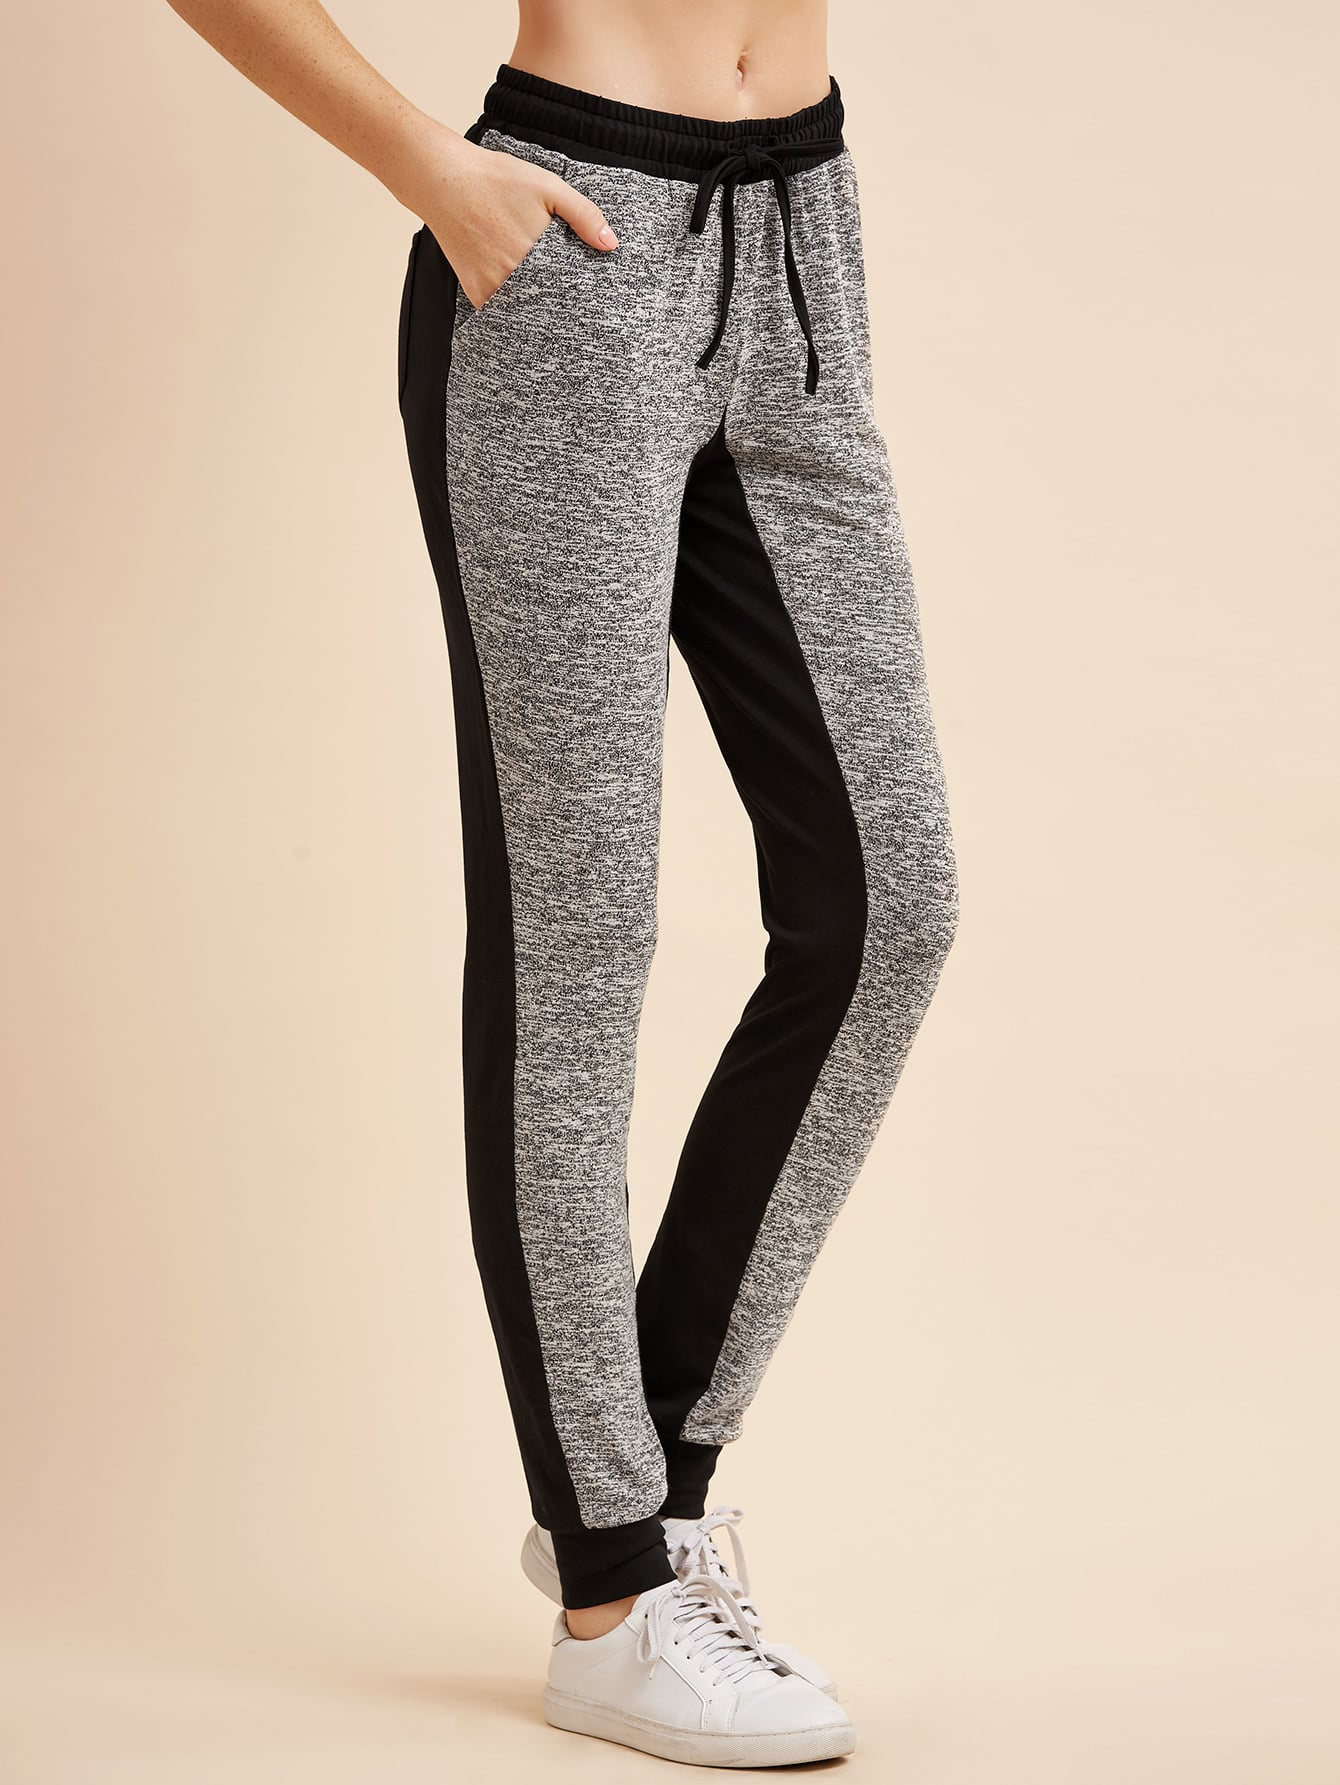 Image of Contrast Marled Knit Drawstring Sweatpants